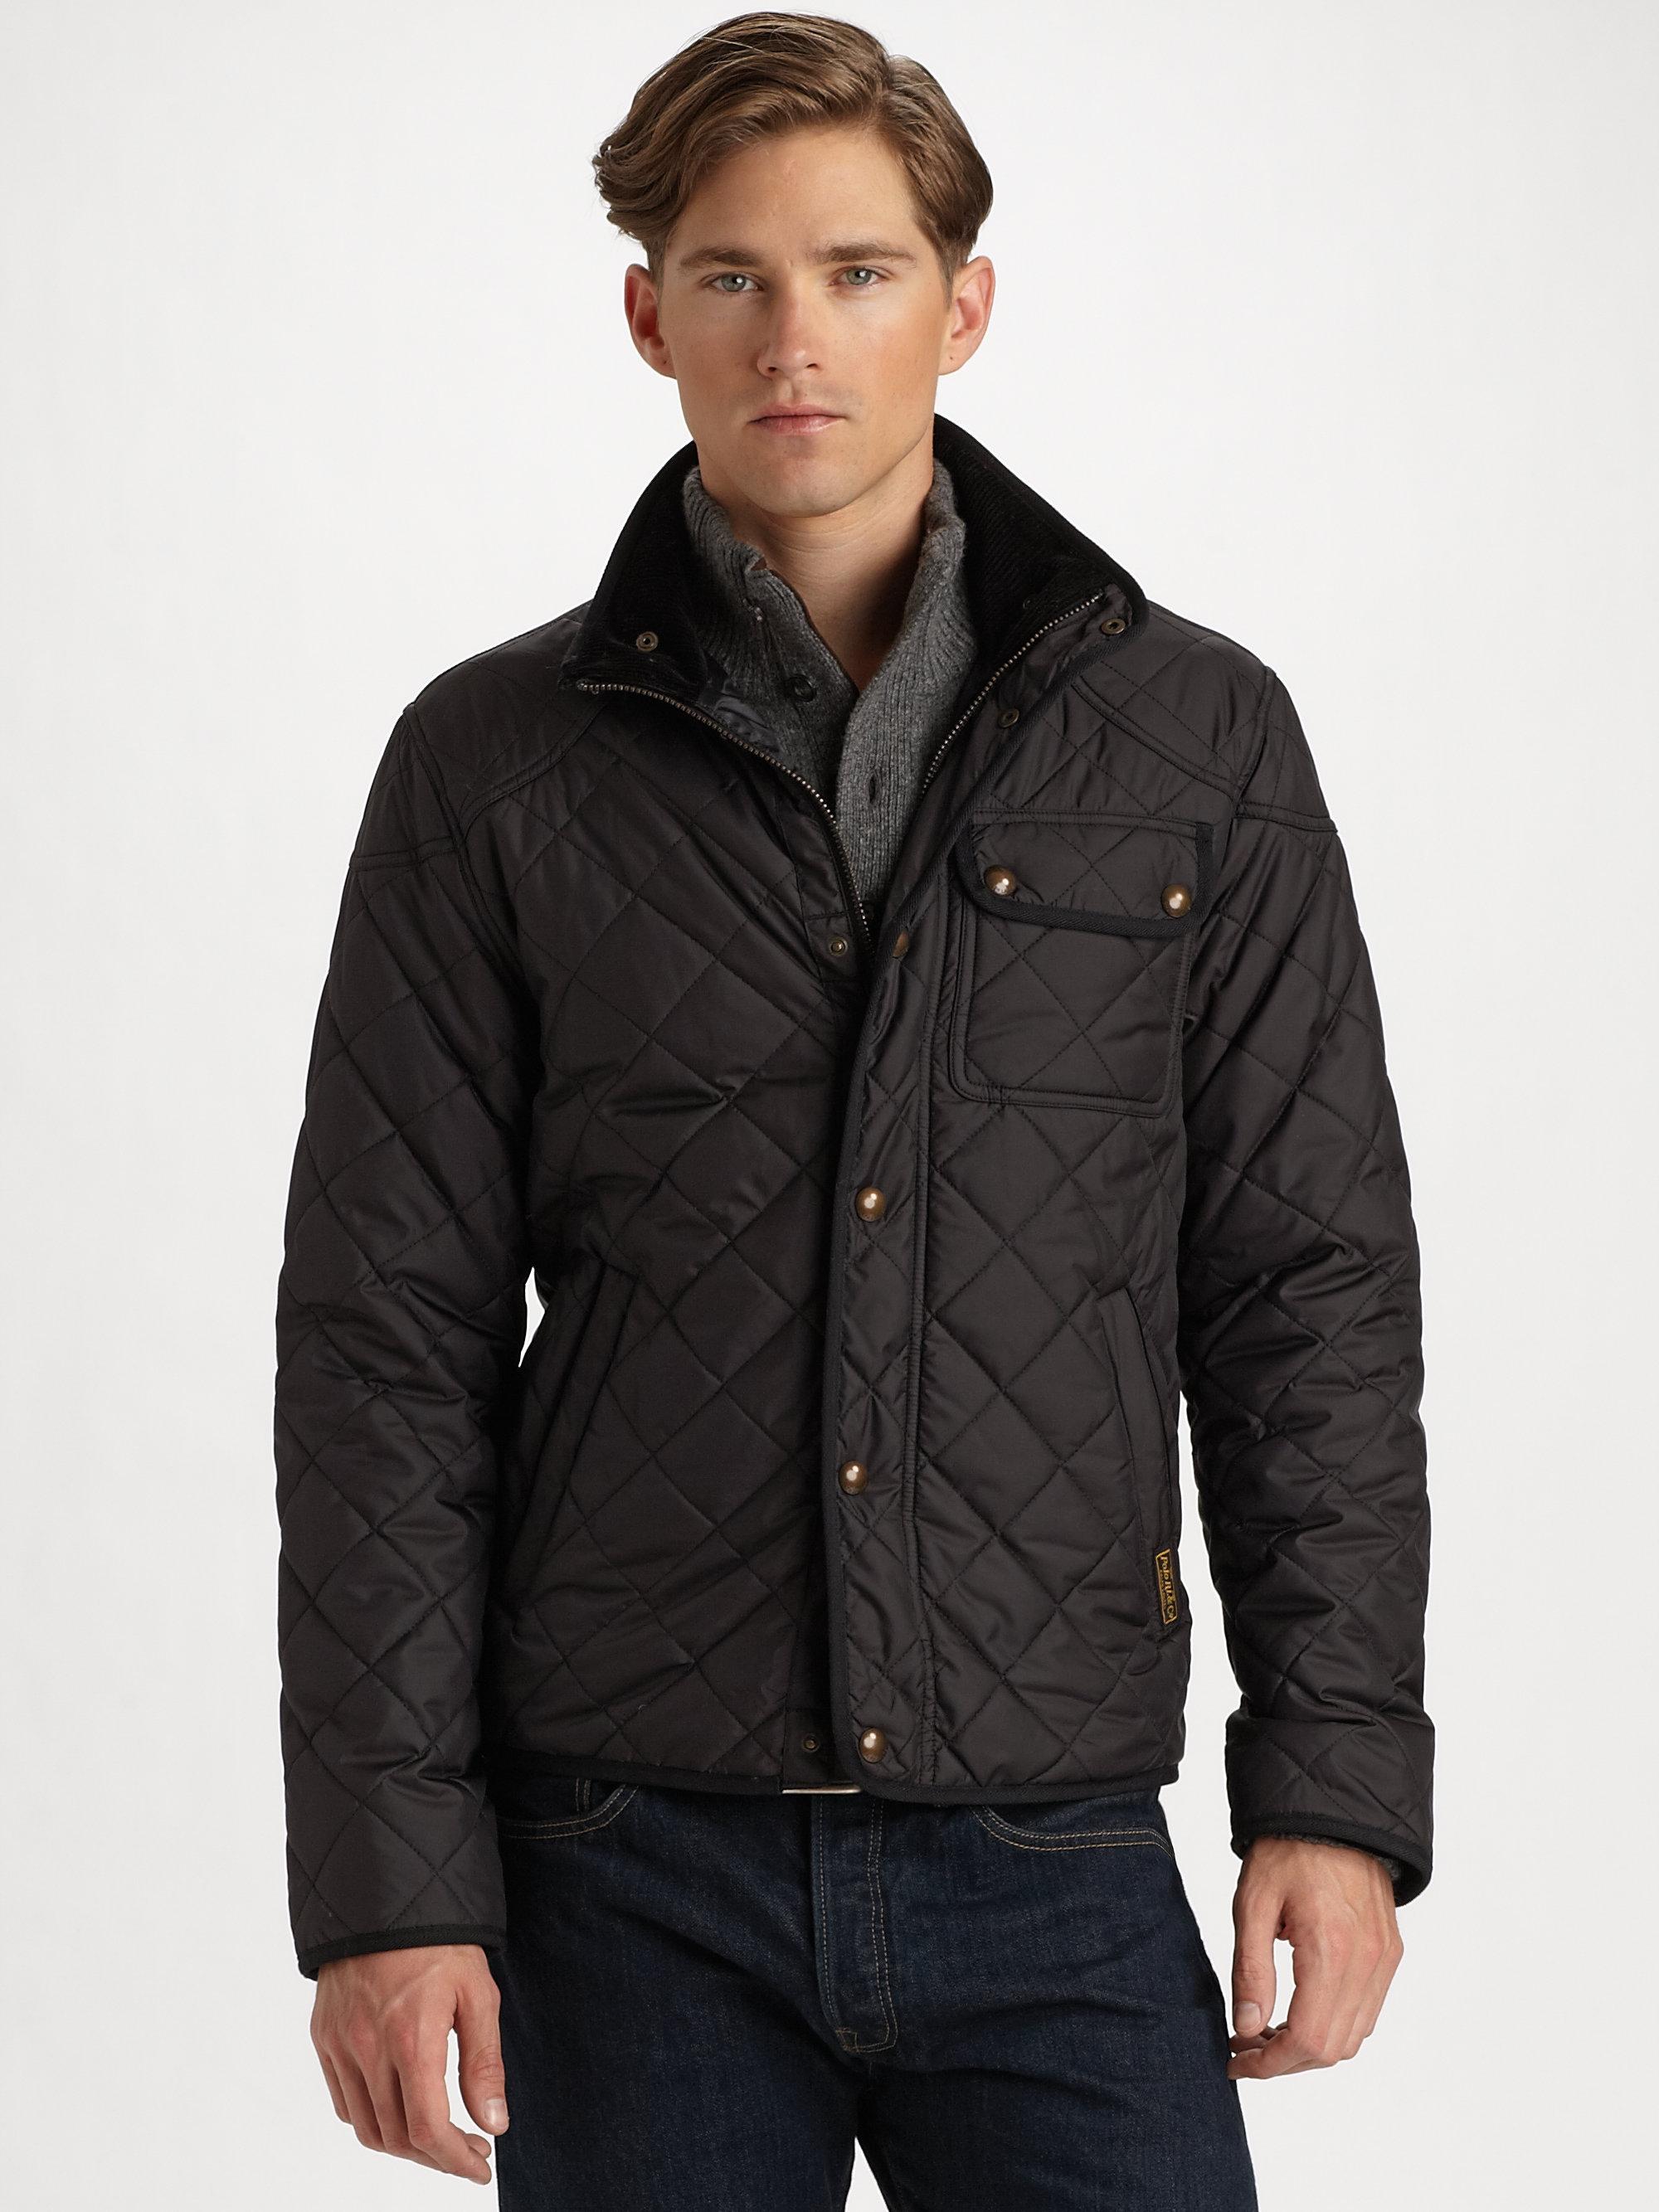 Polo ralph lauren Richmond Quilted Jacket in Black for Men | Lyst : ralph lauren quilted blazer - Adamdwight.com